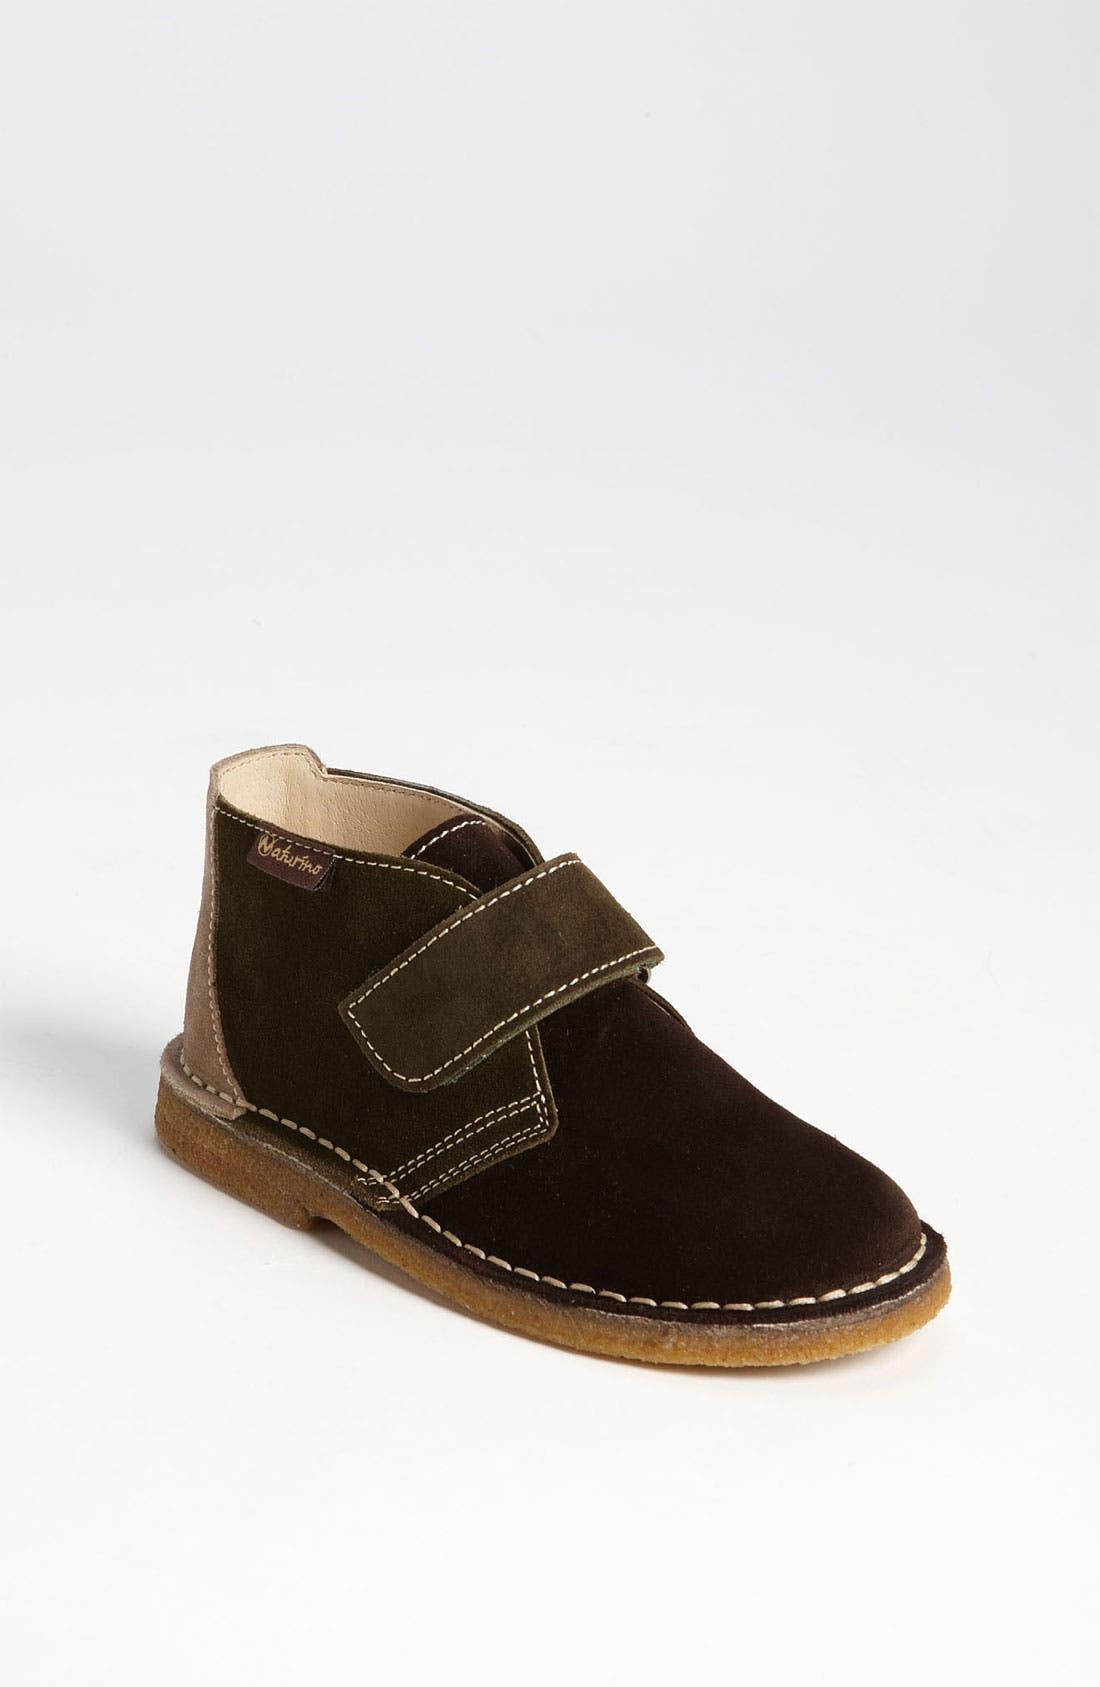 Main Image - Naturino '4201' Boot (Walker & Toddler)